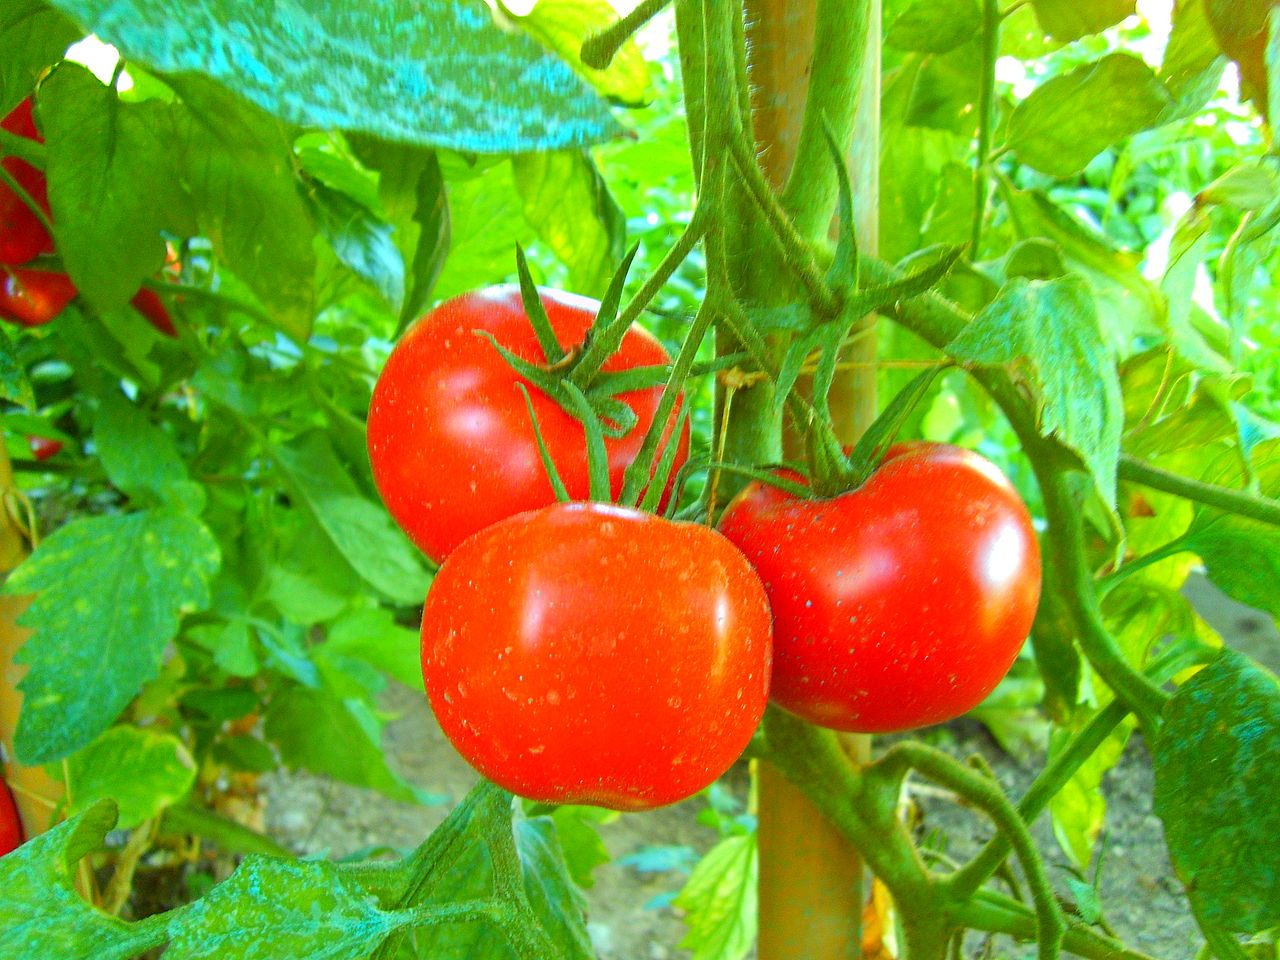 1280px-tomaten_tomatoes_pomodori.jpg